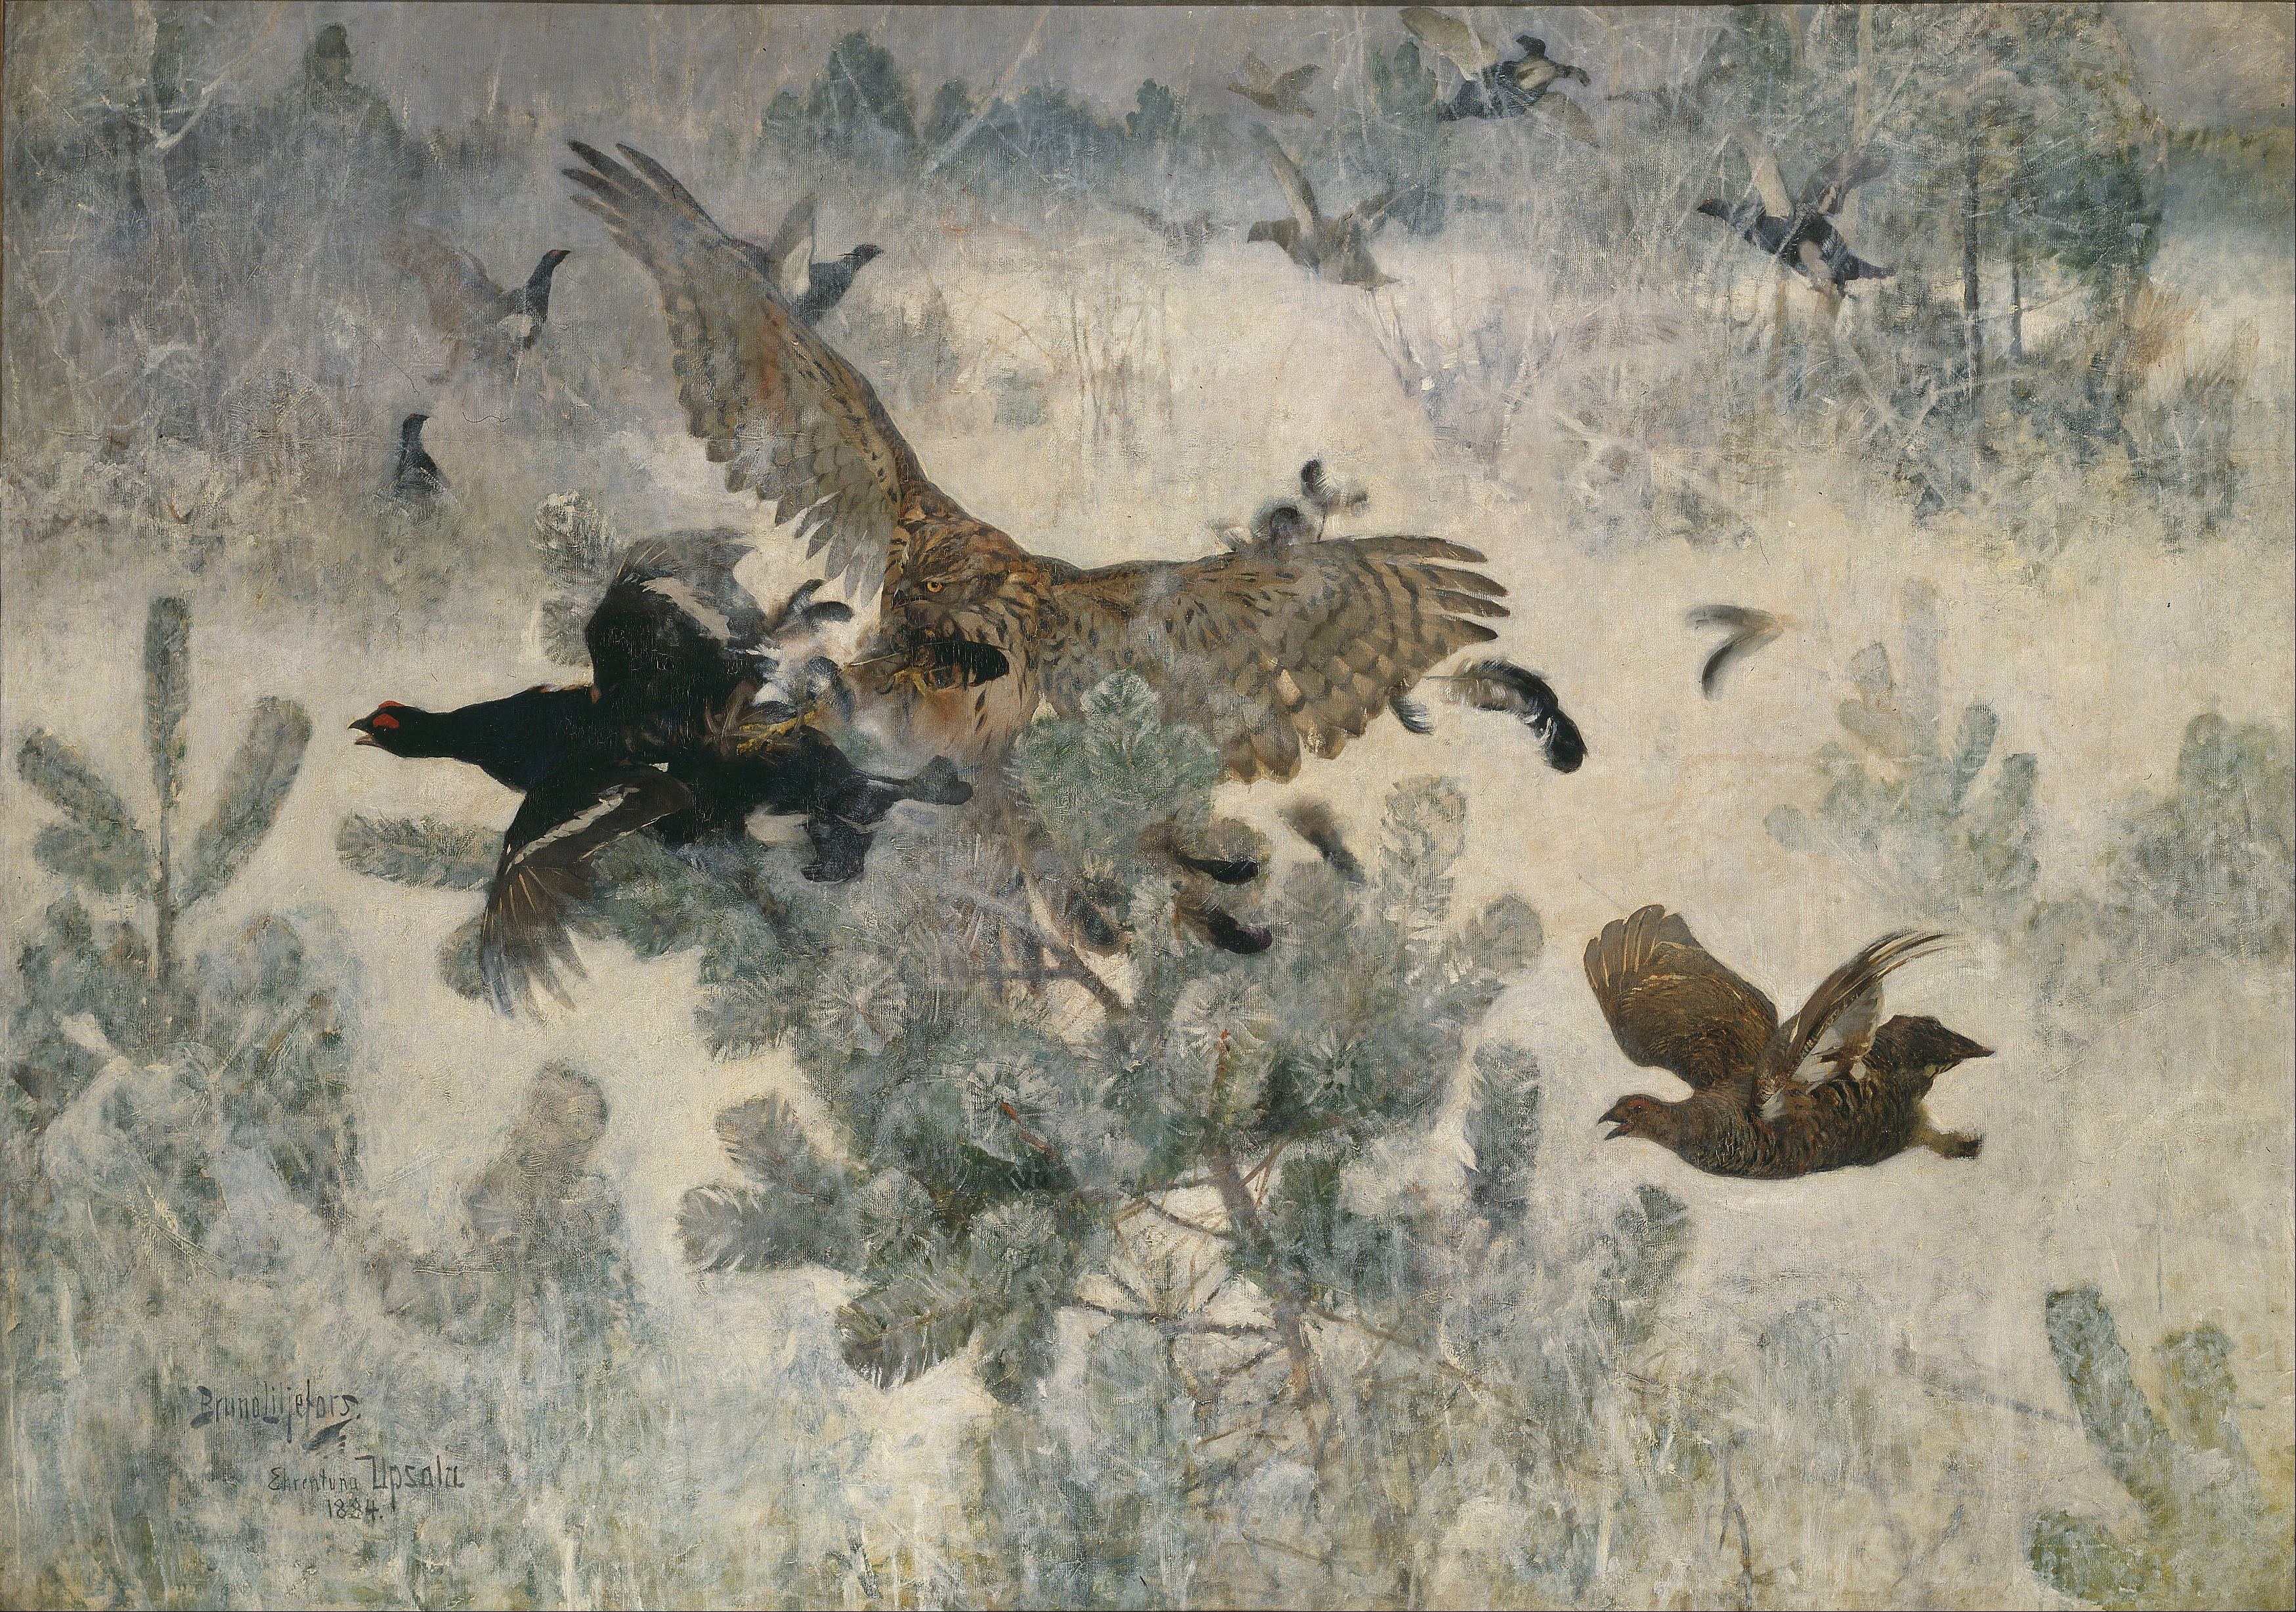 bruno liljefors - hawk and black-game - google art project.jpg